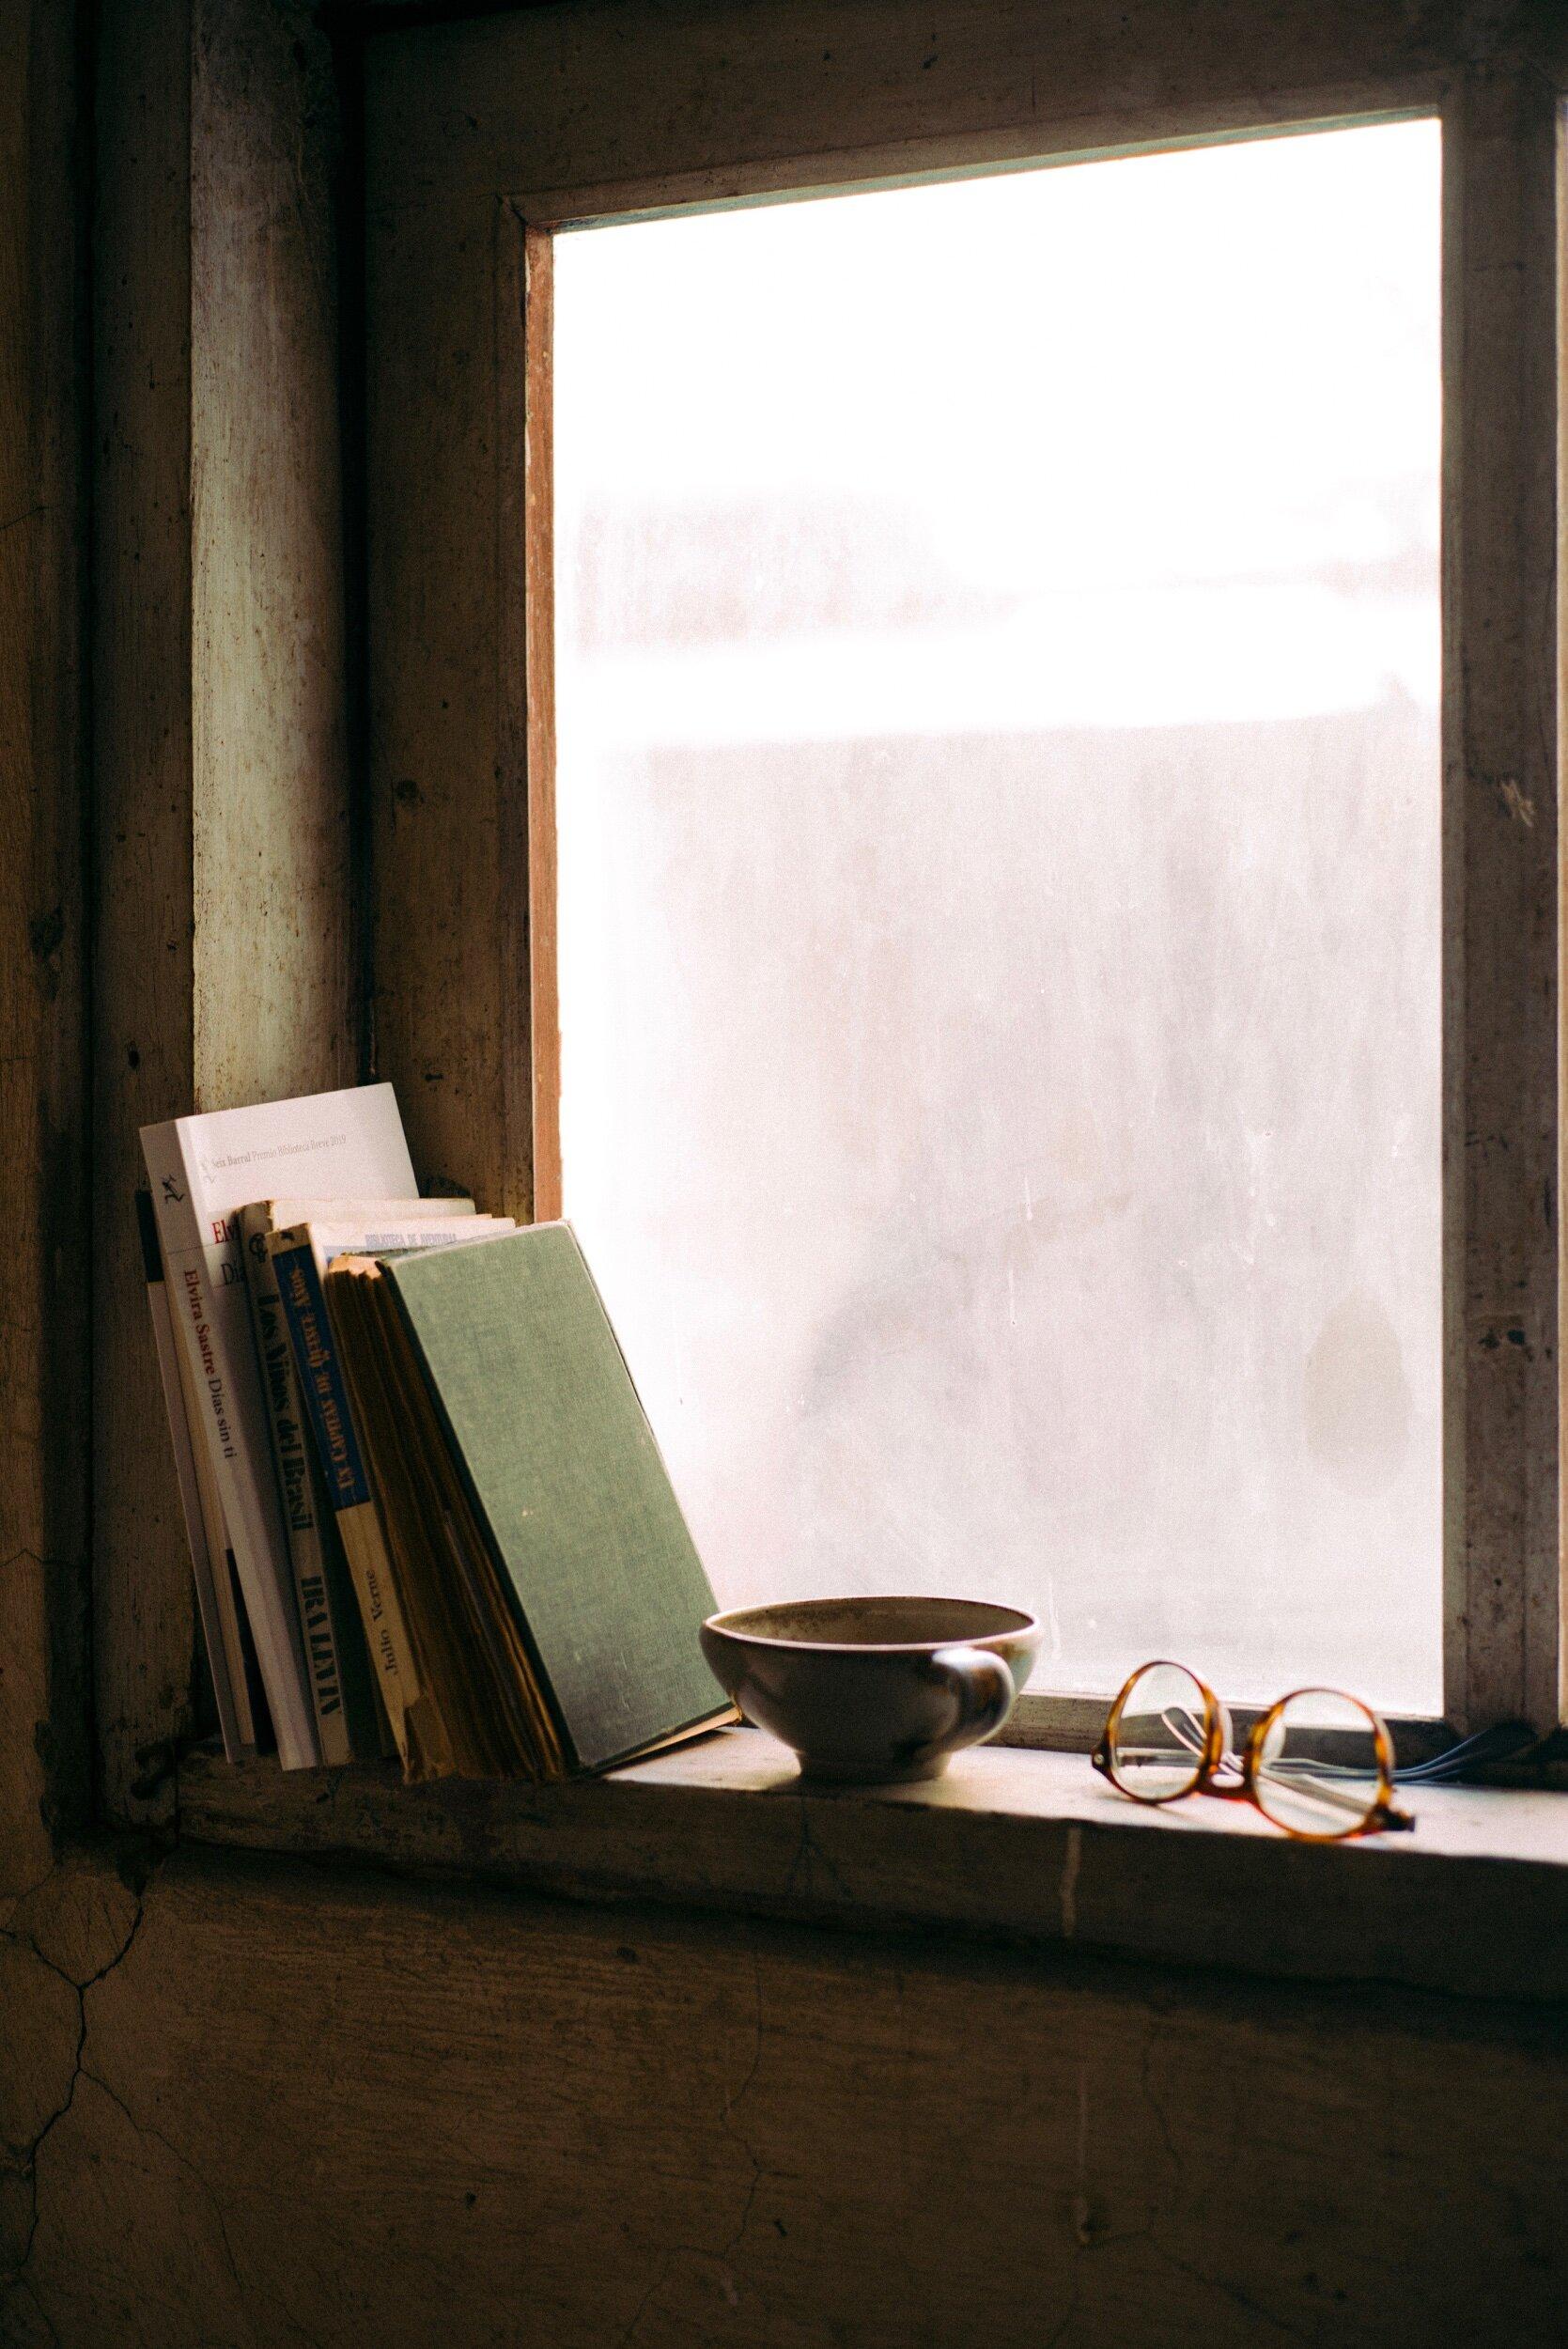 feels so good, feels like home.  Leica M(Typ240) + Summicron-M 50mm f/2.